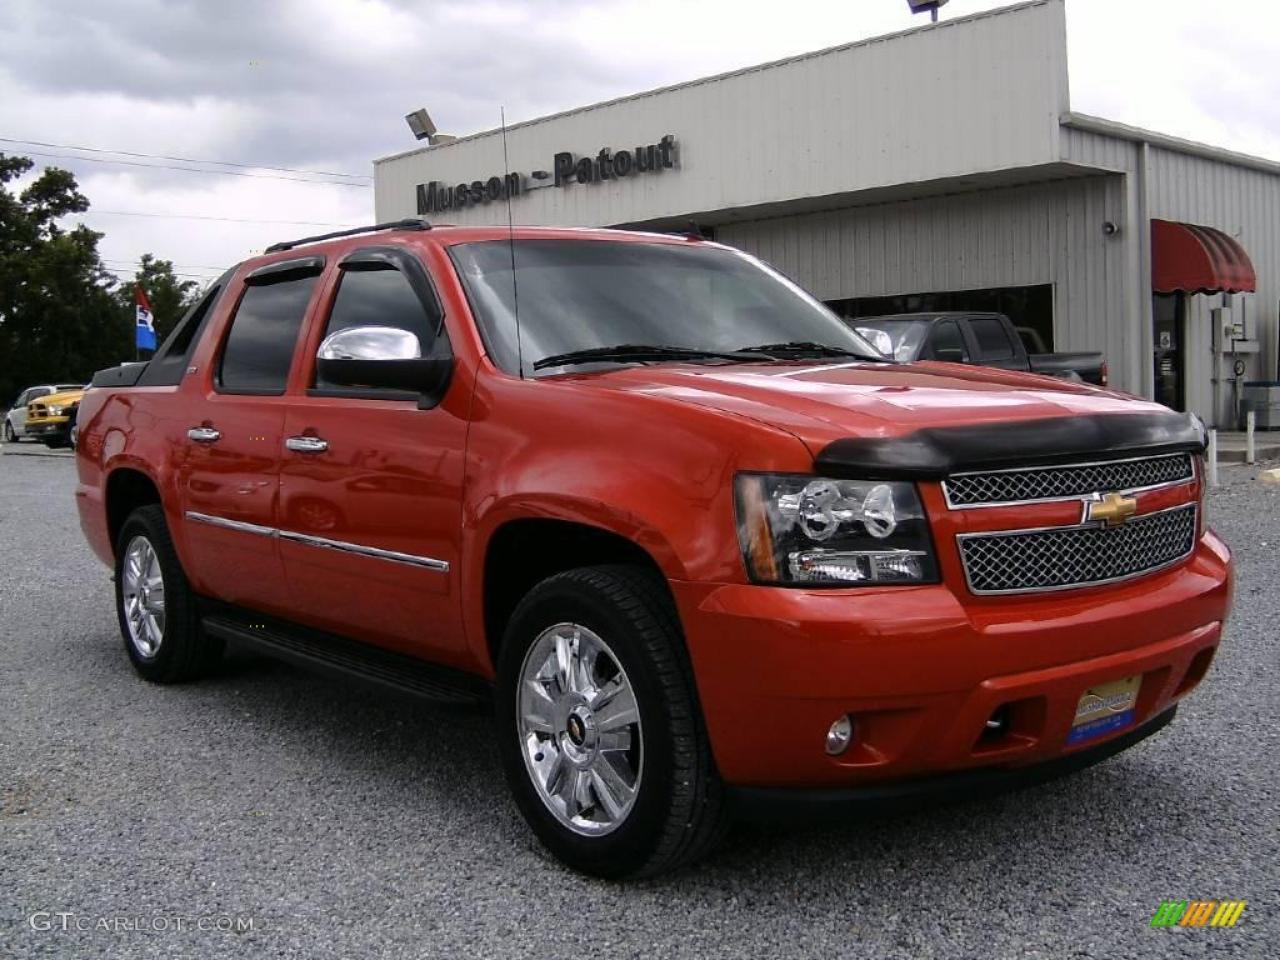 Lifted chevy show trucks 2103 texas heatwave truck show - 800 1024 1280 1600 Origin 2009 Chevrolet